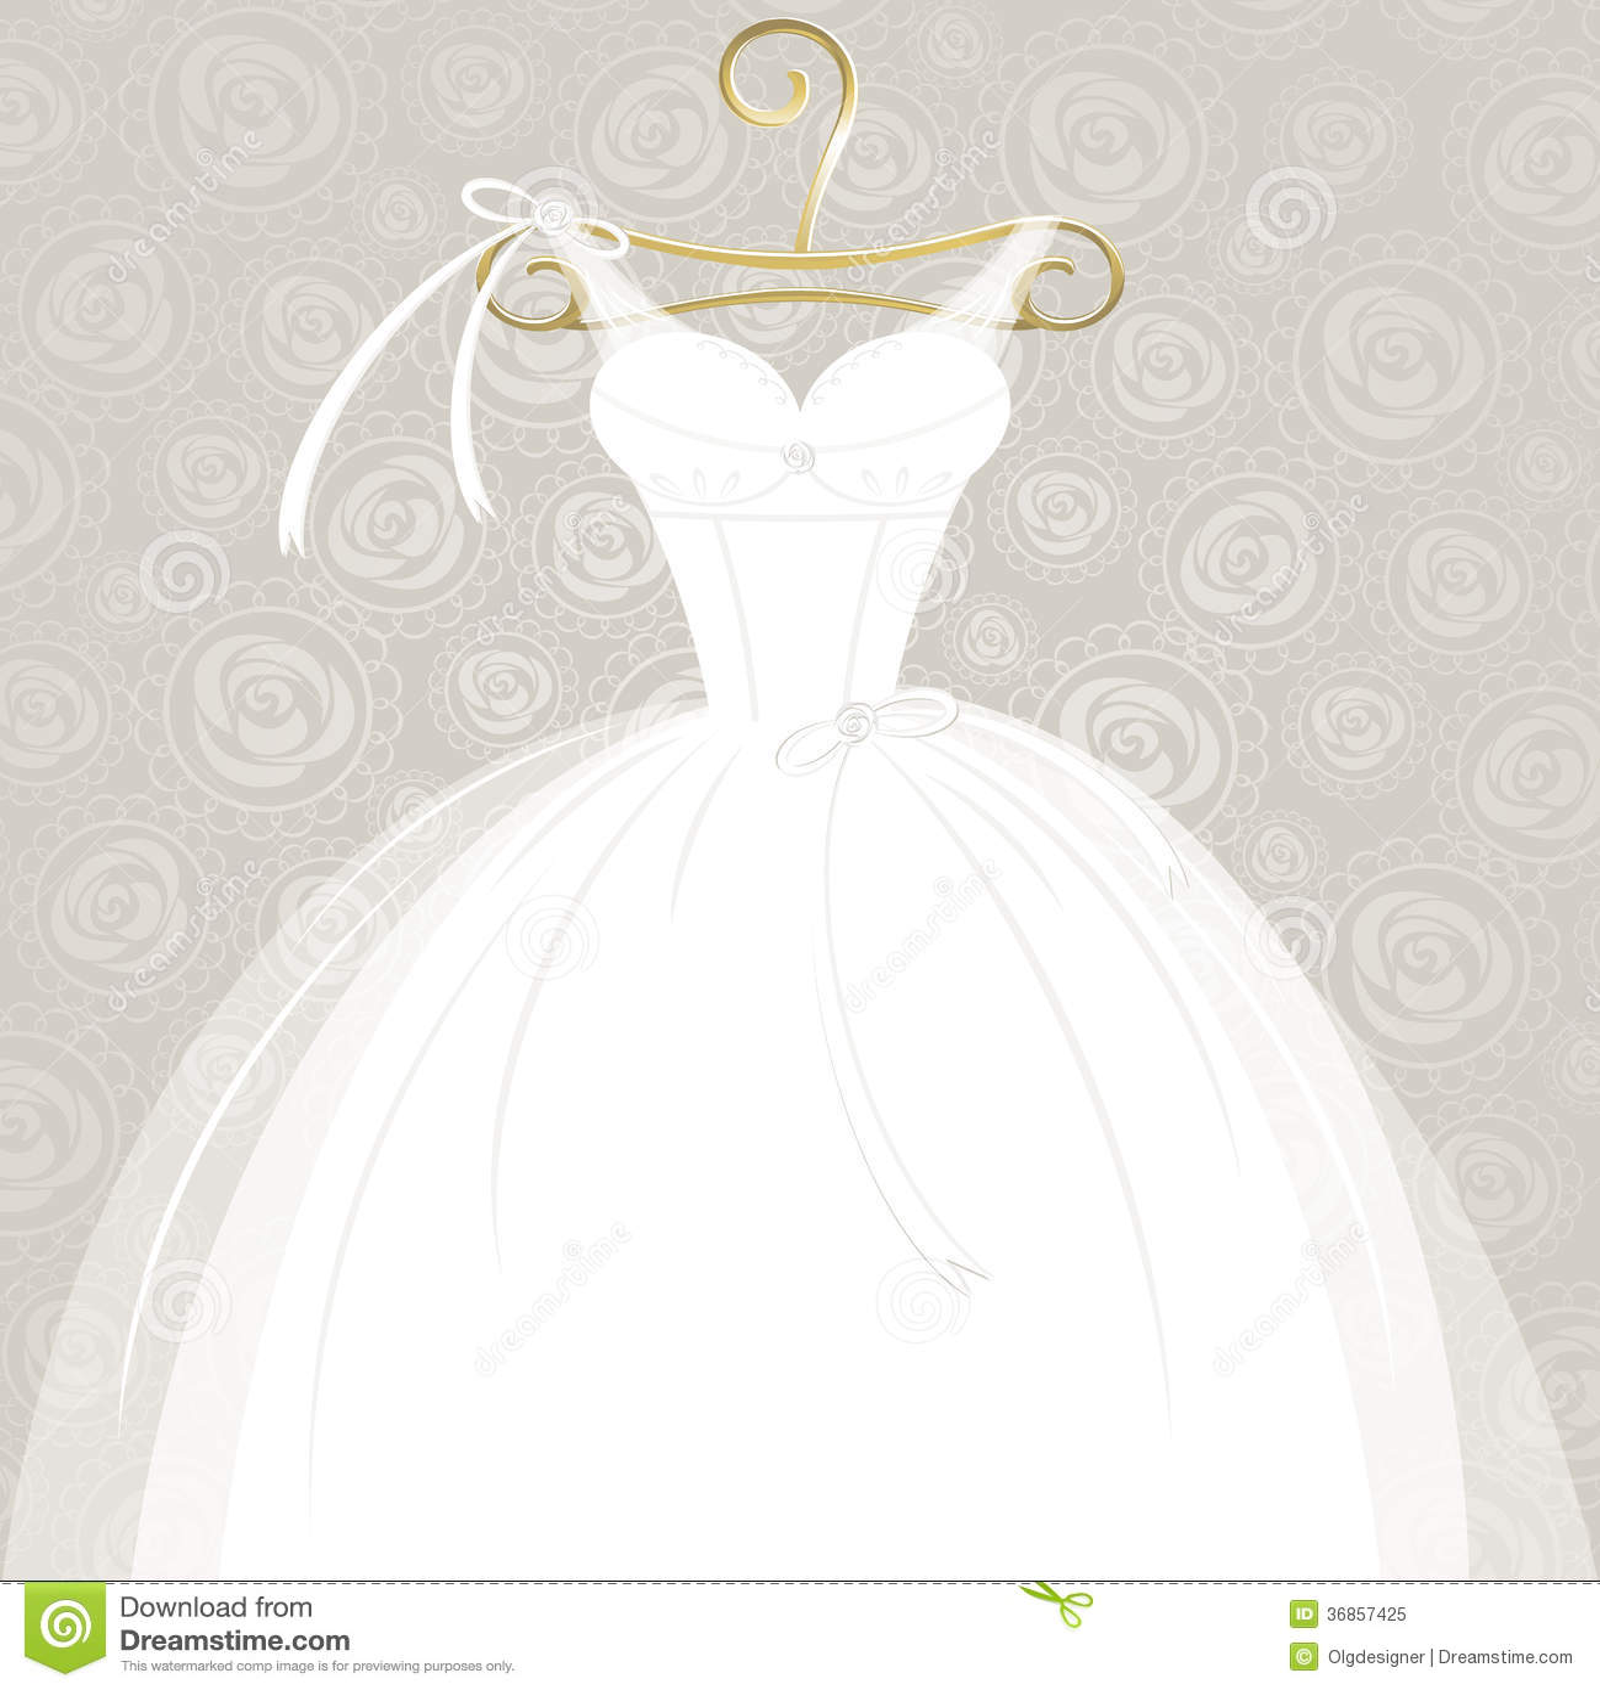 White Wedding Gown Royalty Free Stock Photo - Image: 36857425